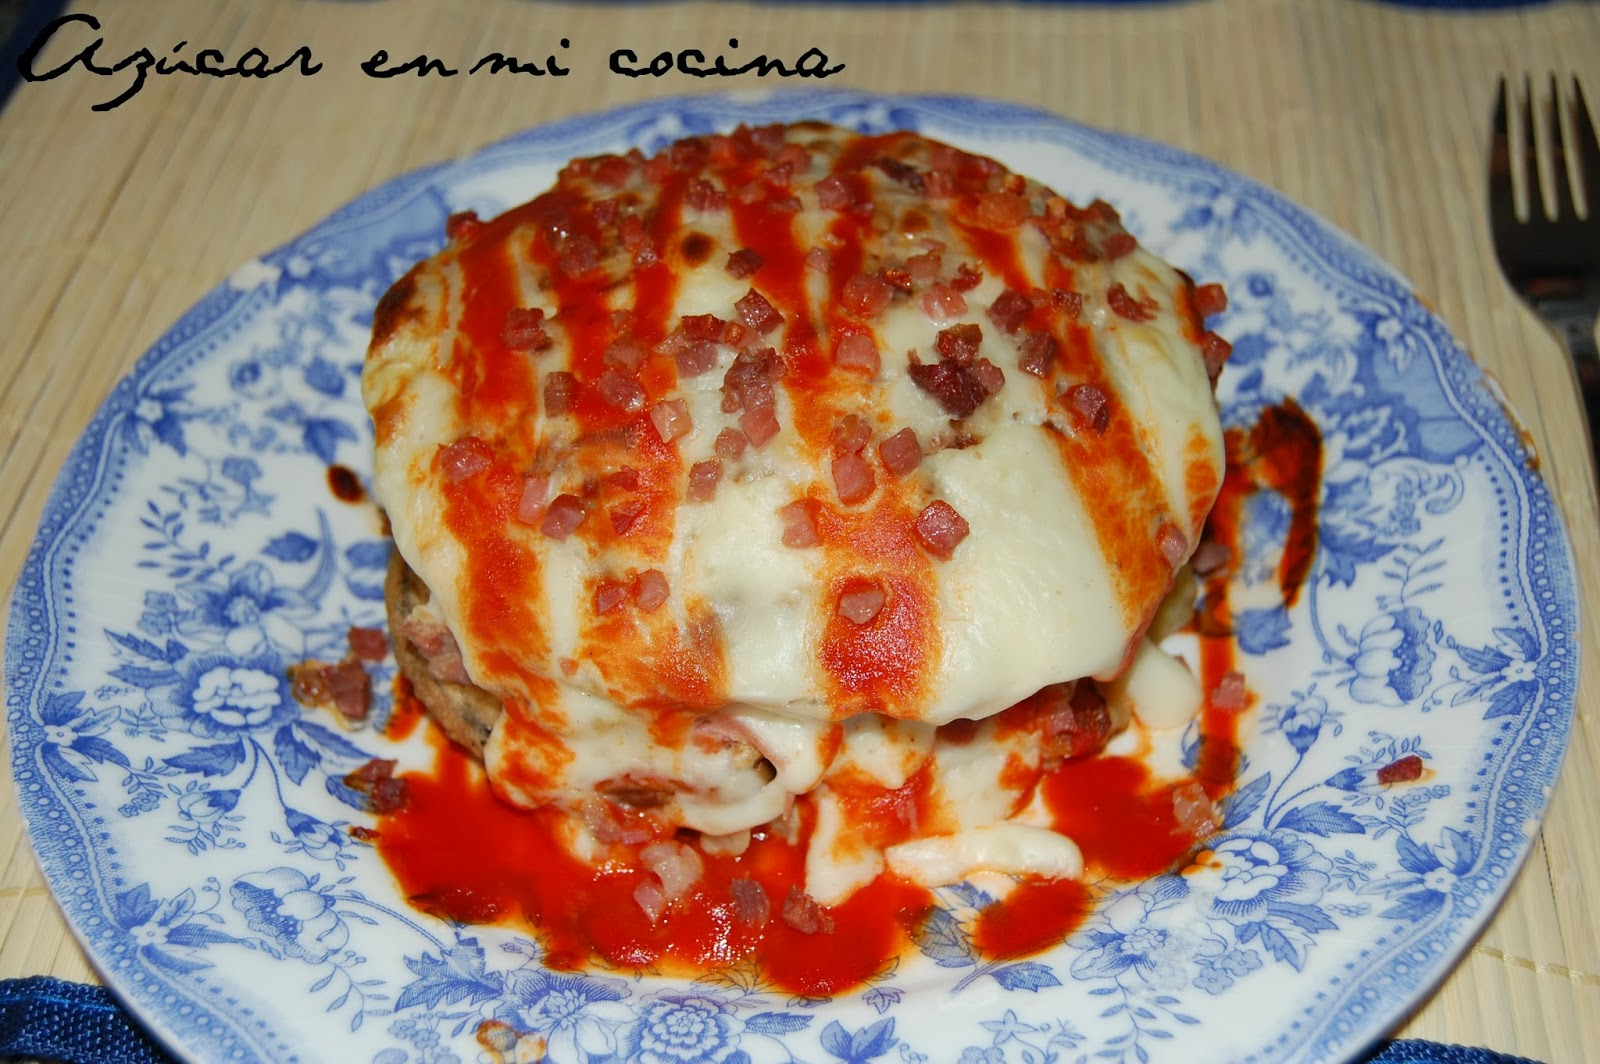 http://azucarenmicocina.blogspot.com.es/2013/11/milhojas-creps-de-tortilla-espanola-5.html